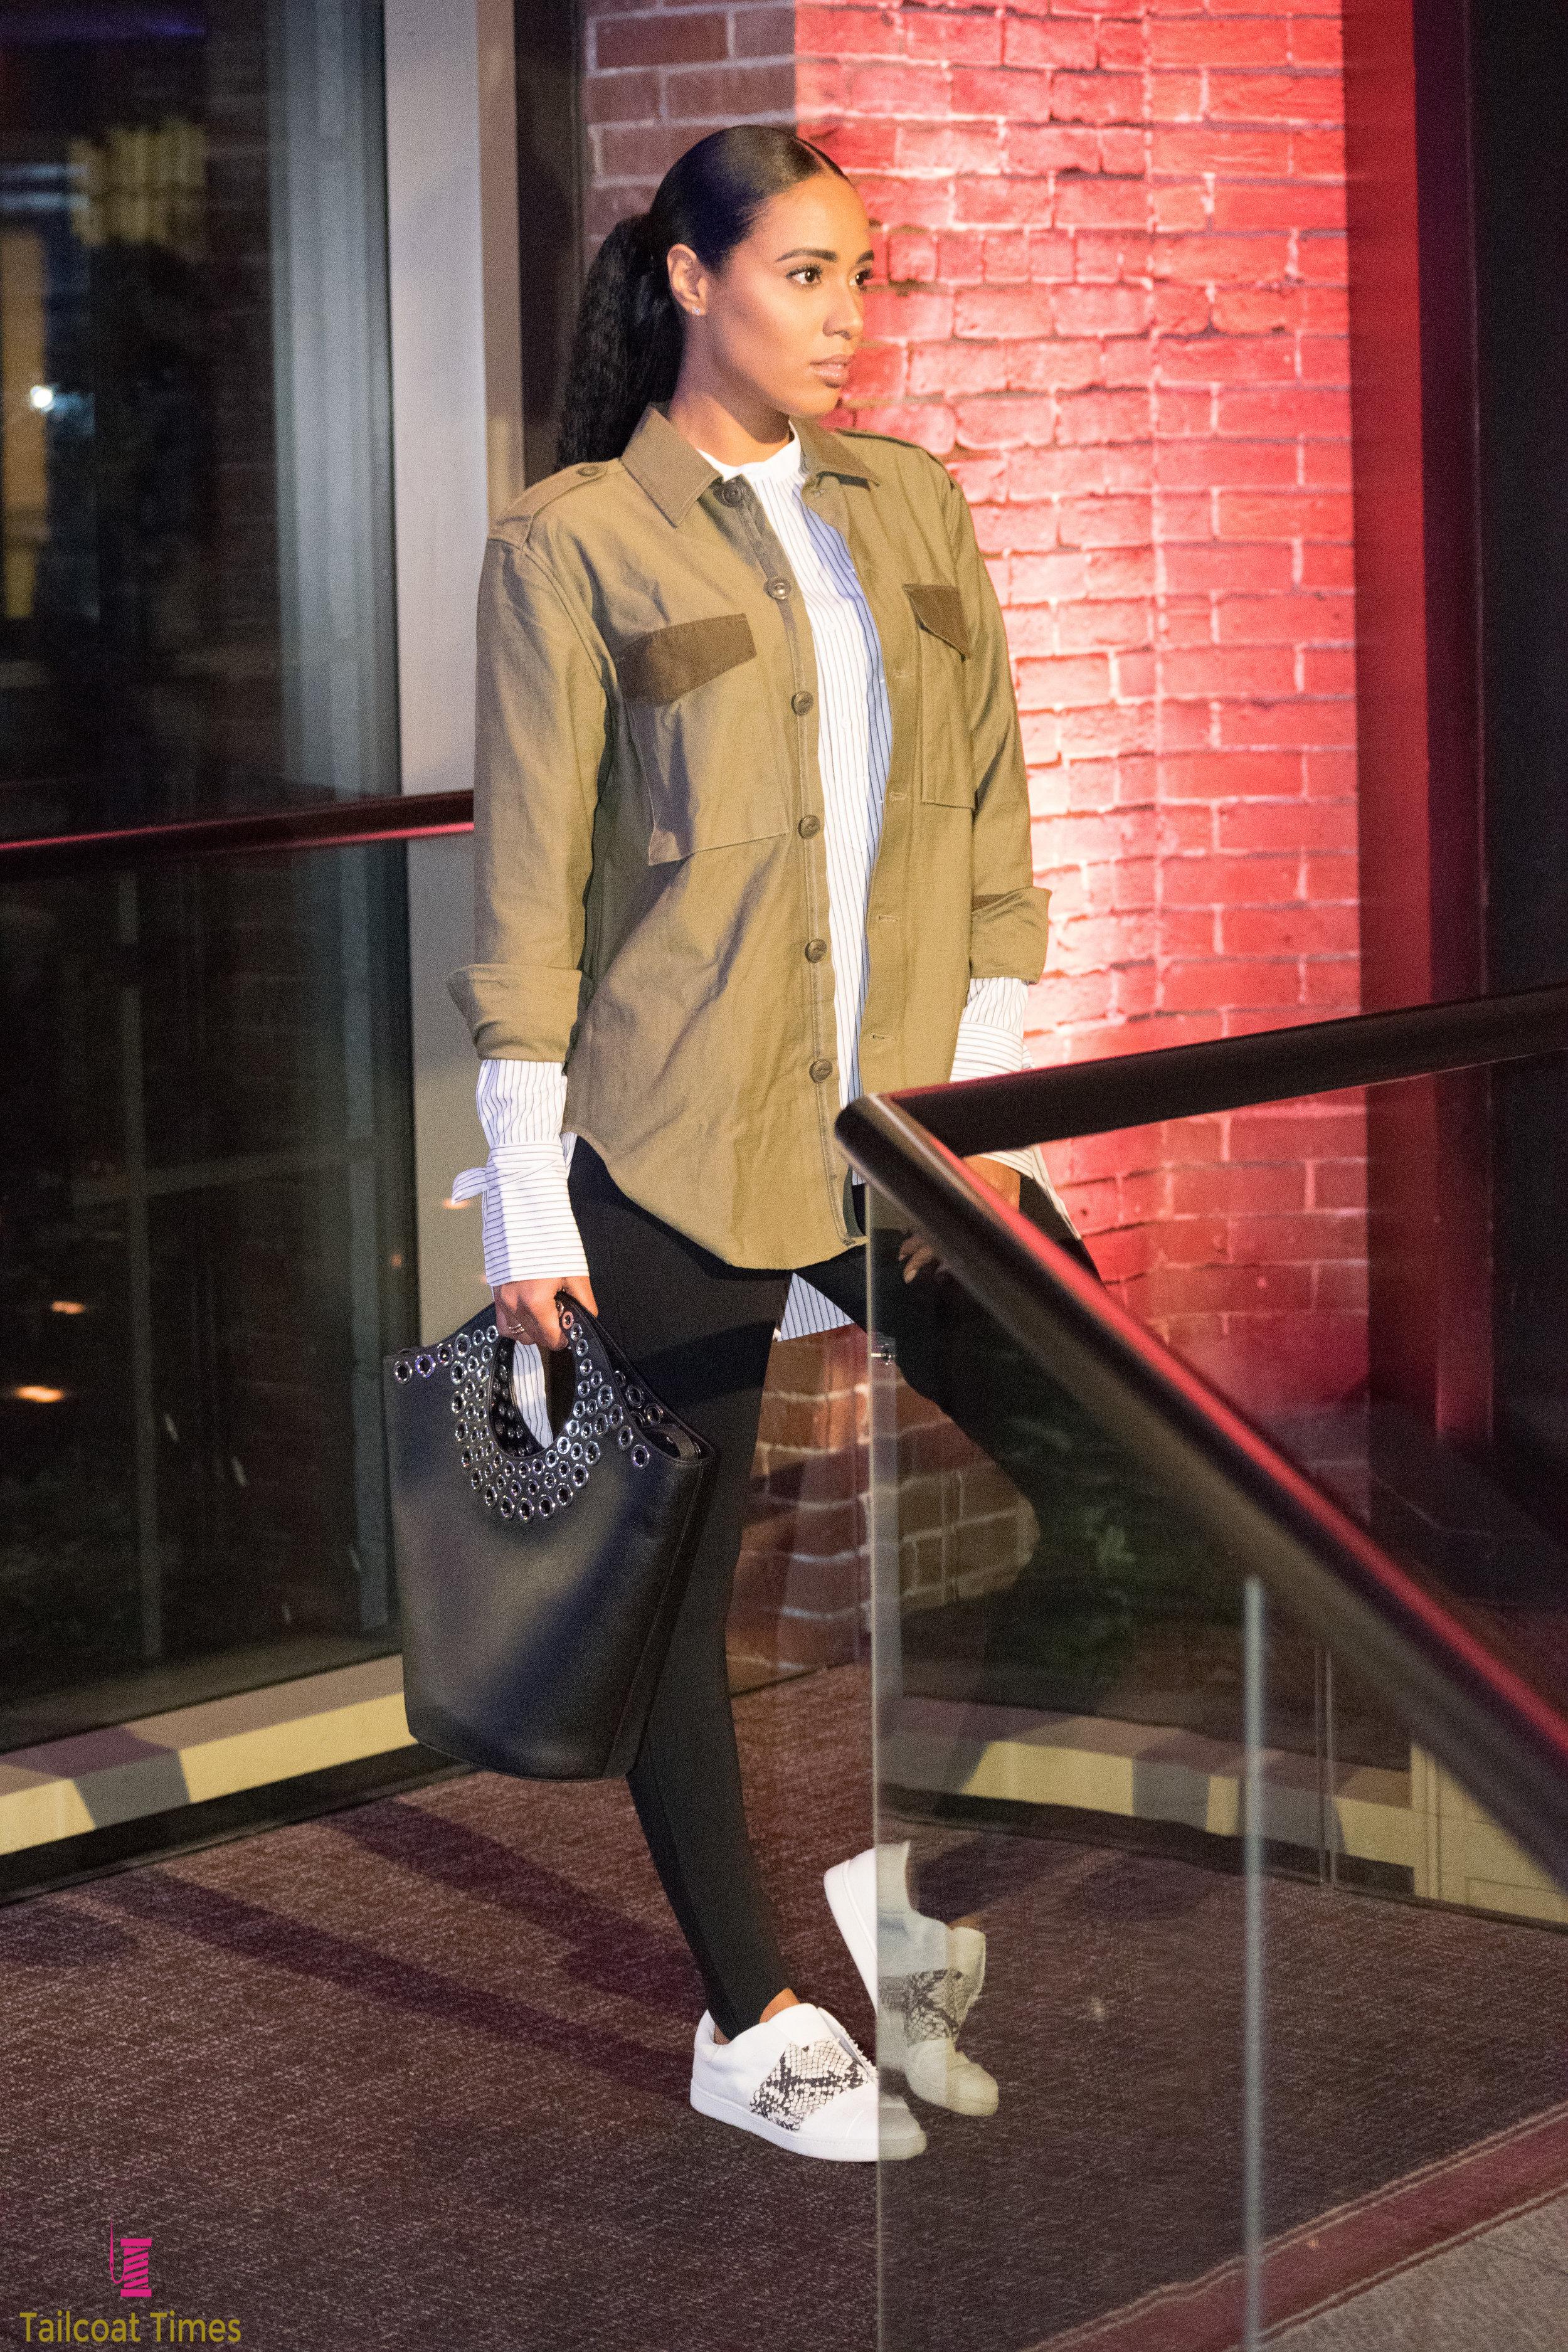 FashionablyLate_TrunkShow_Tailcoat Times (40 of 48).jpg